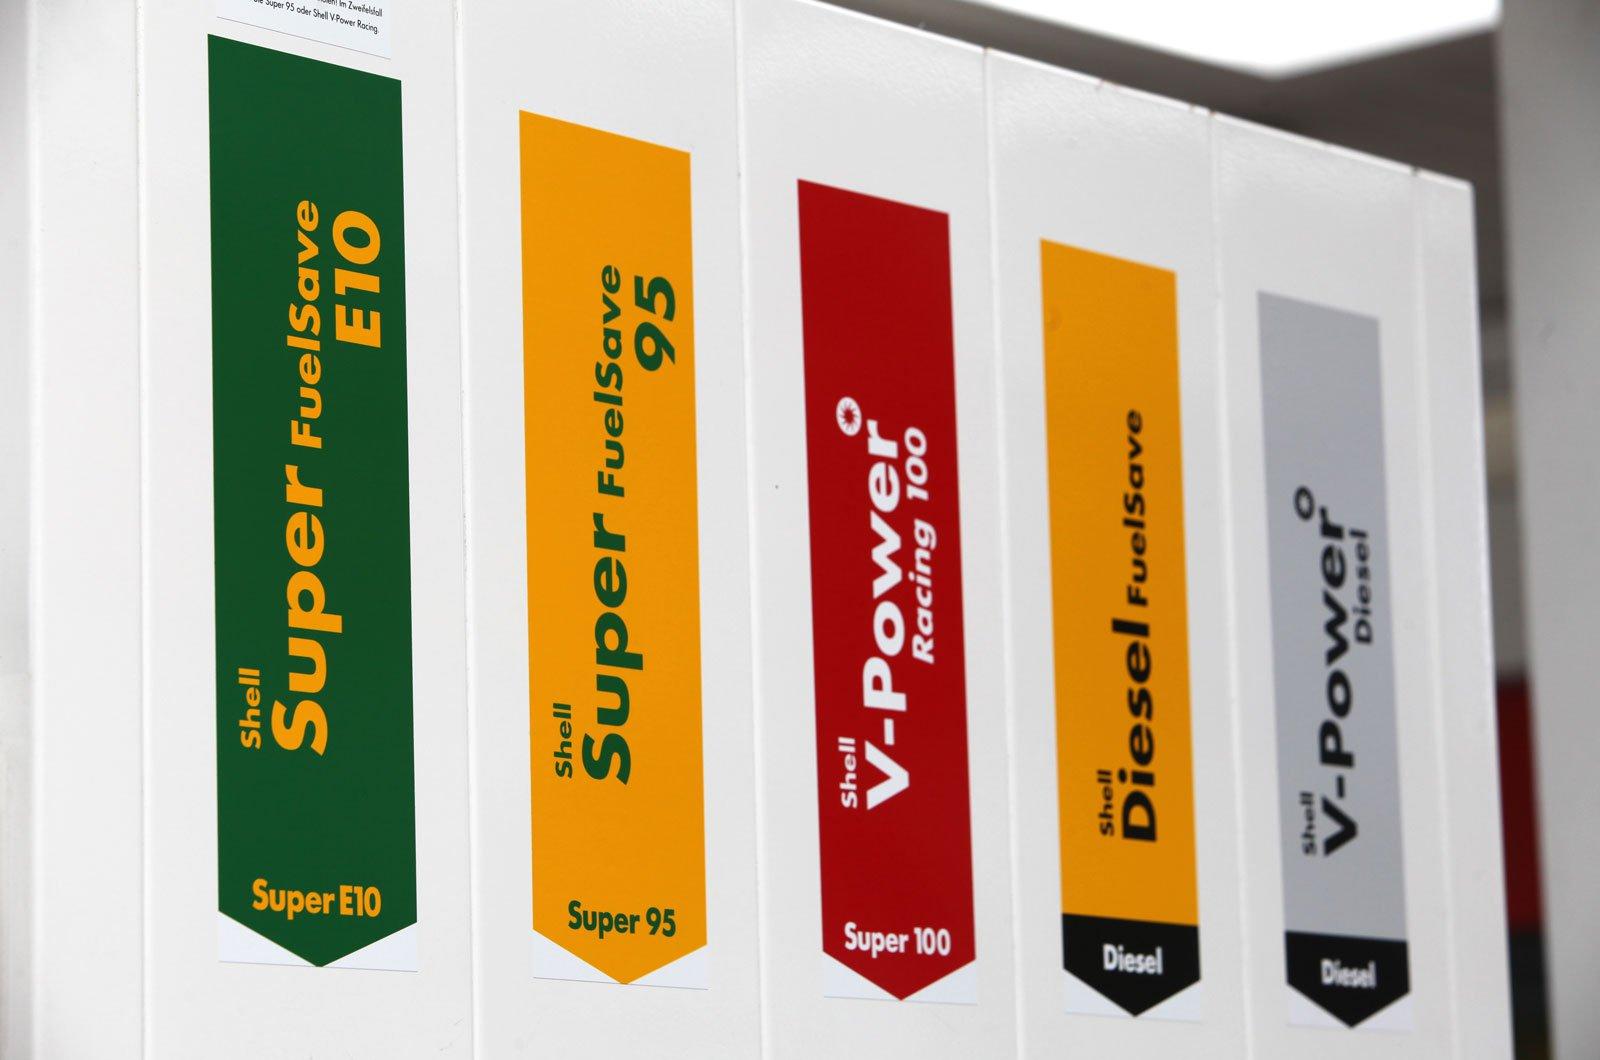 E10 biofuels fuel filling station labels